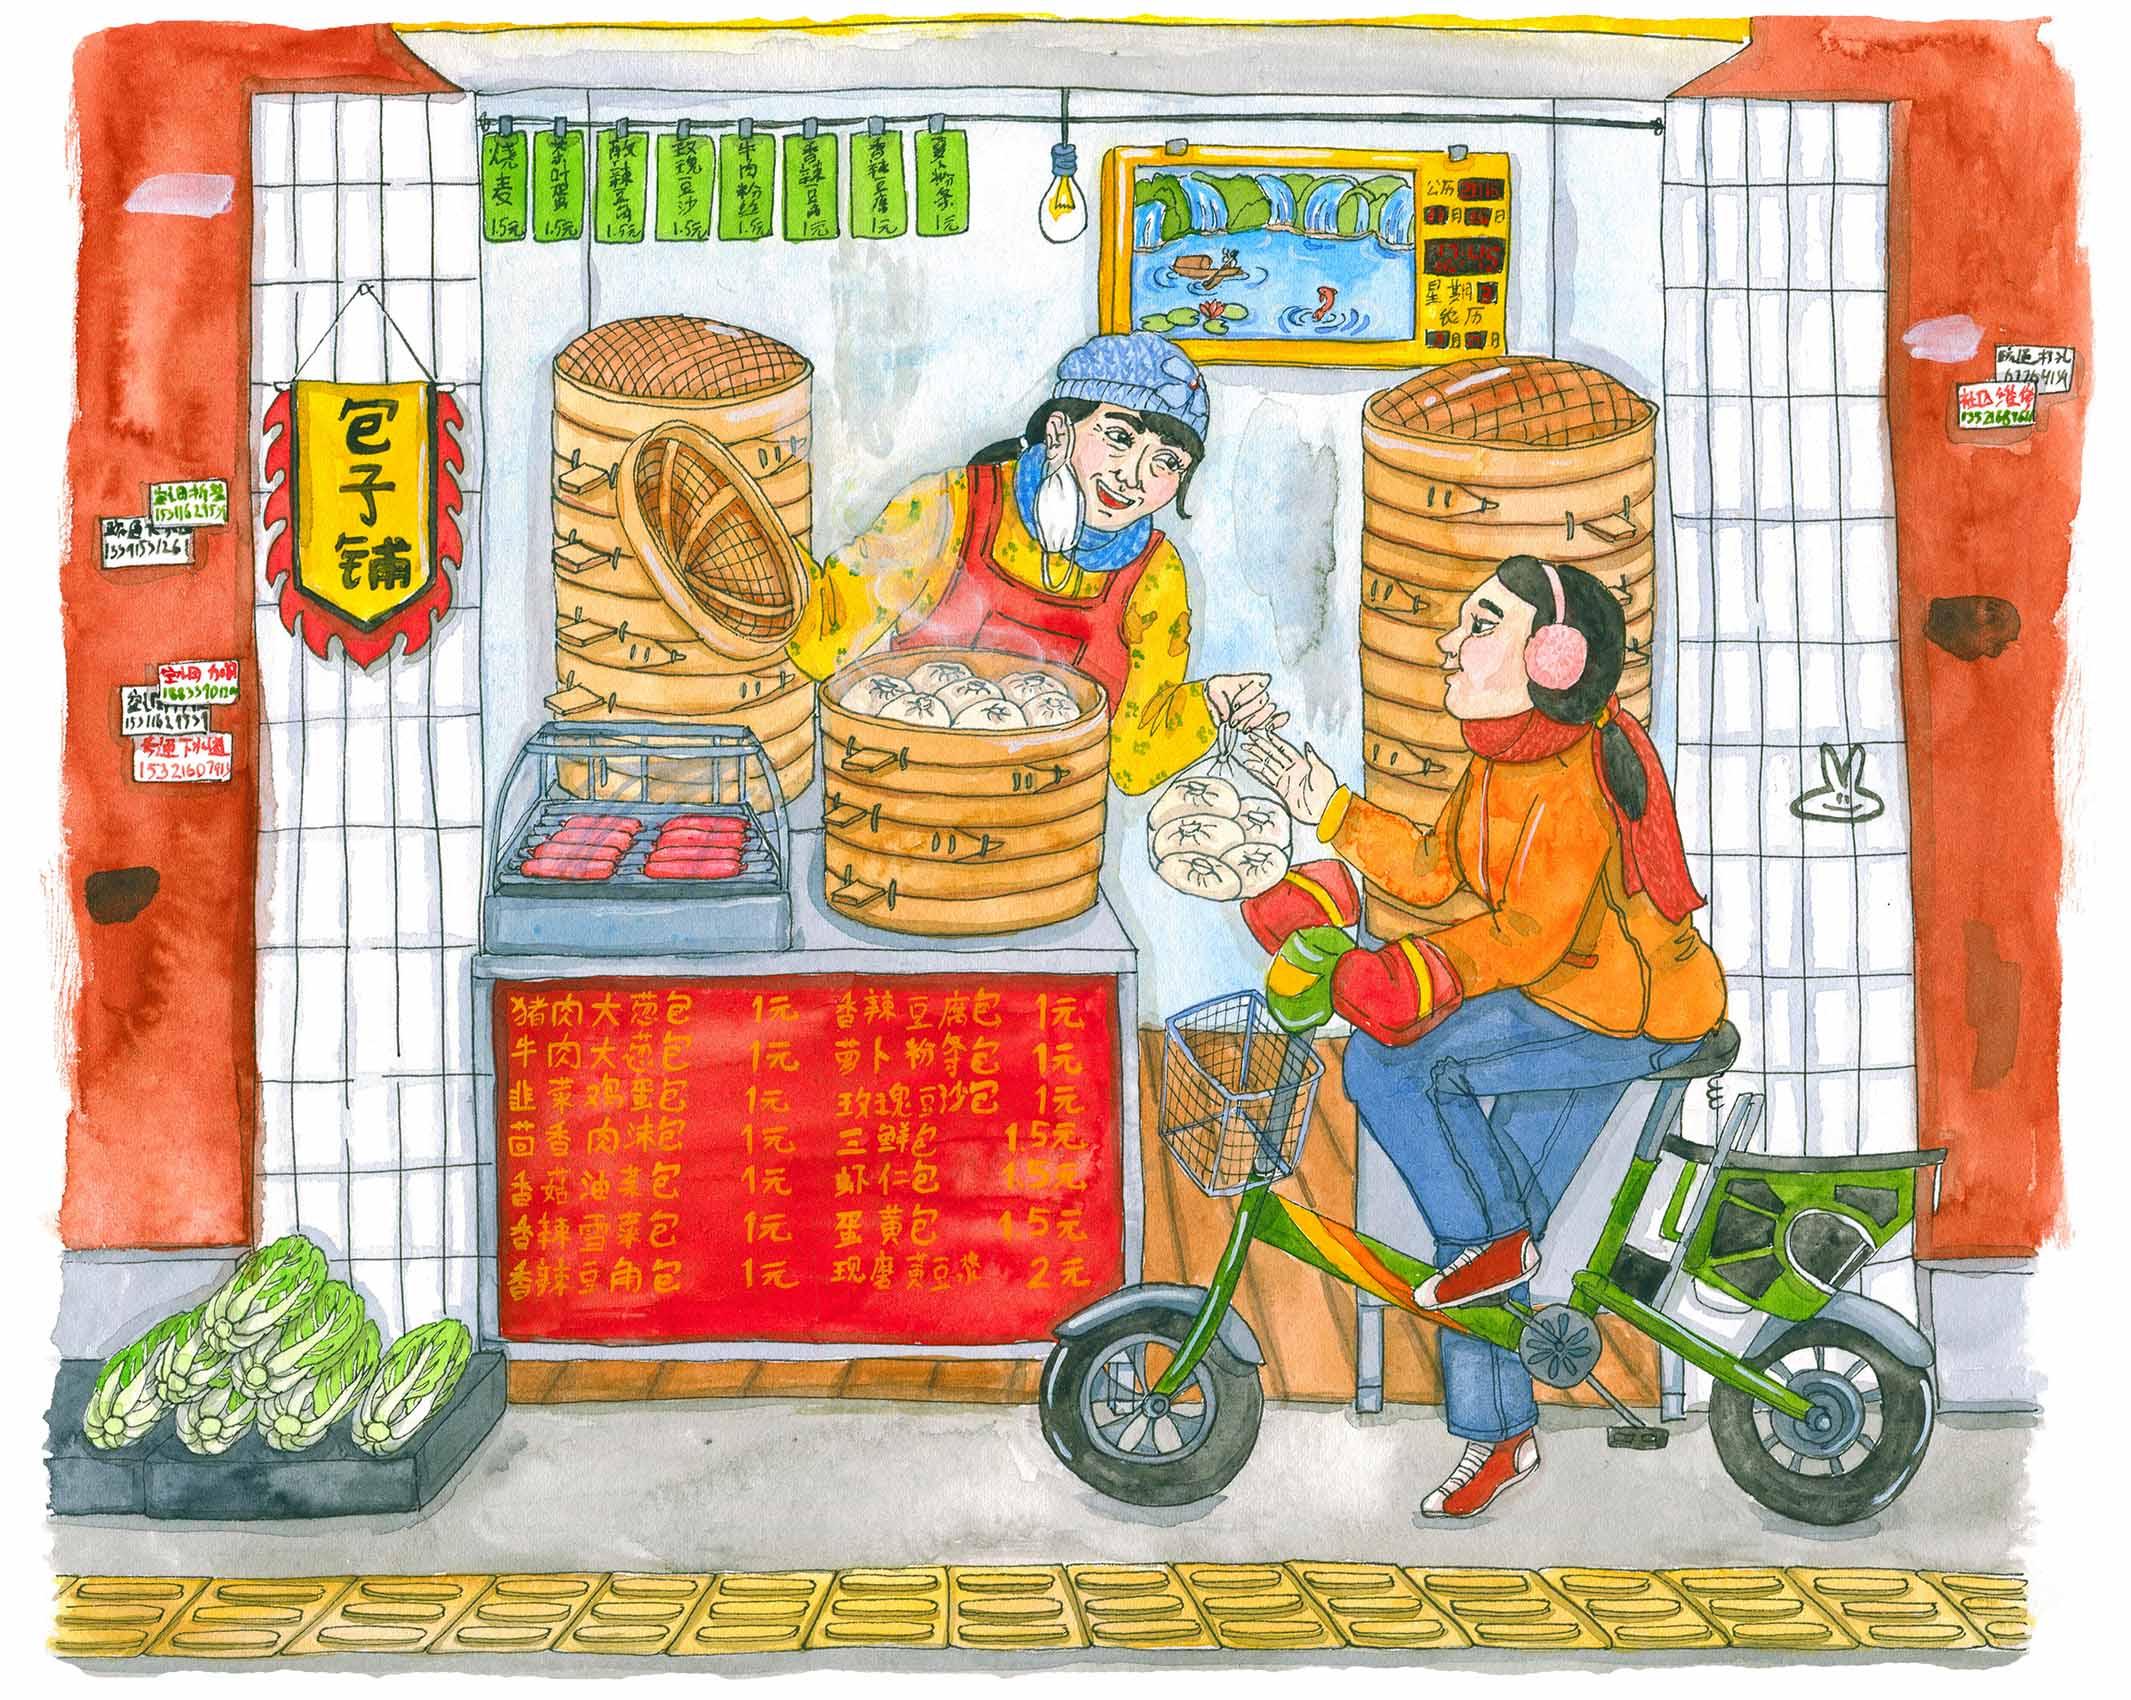 Baozi shop